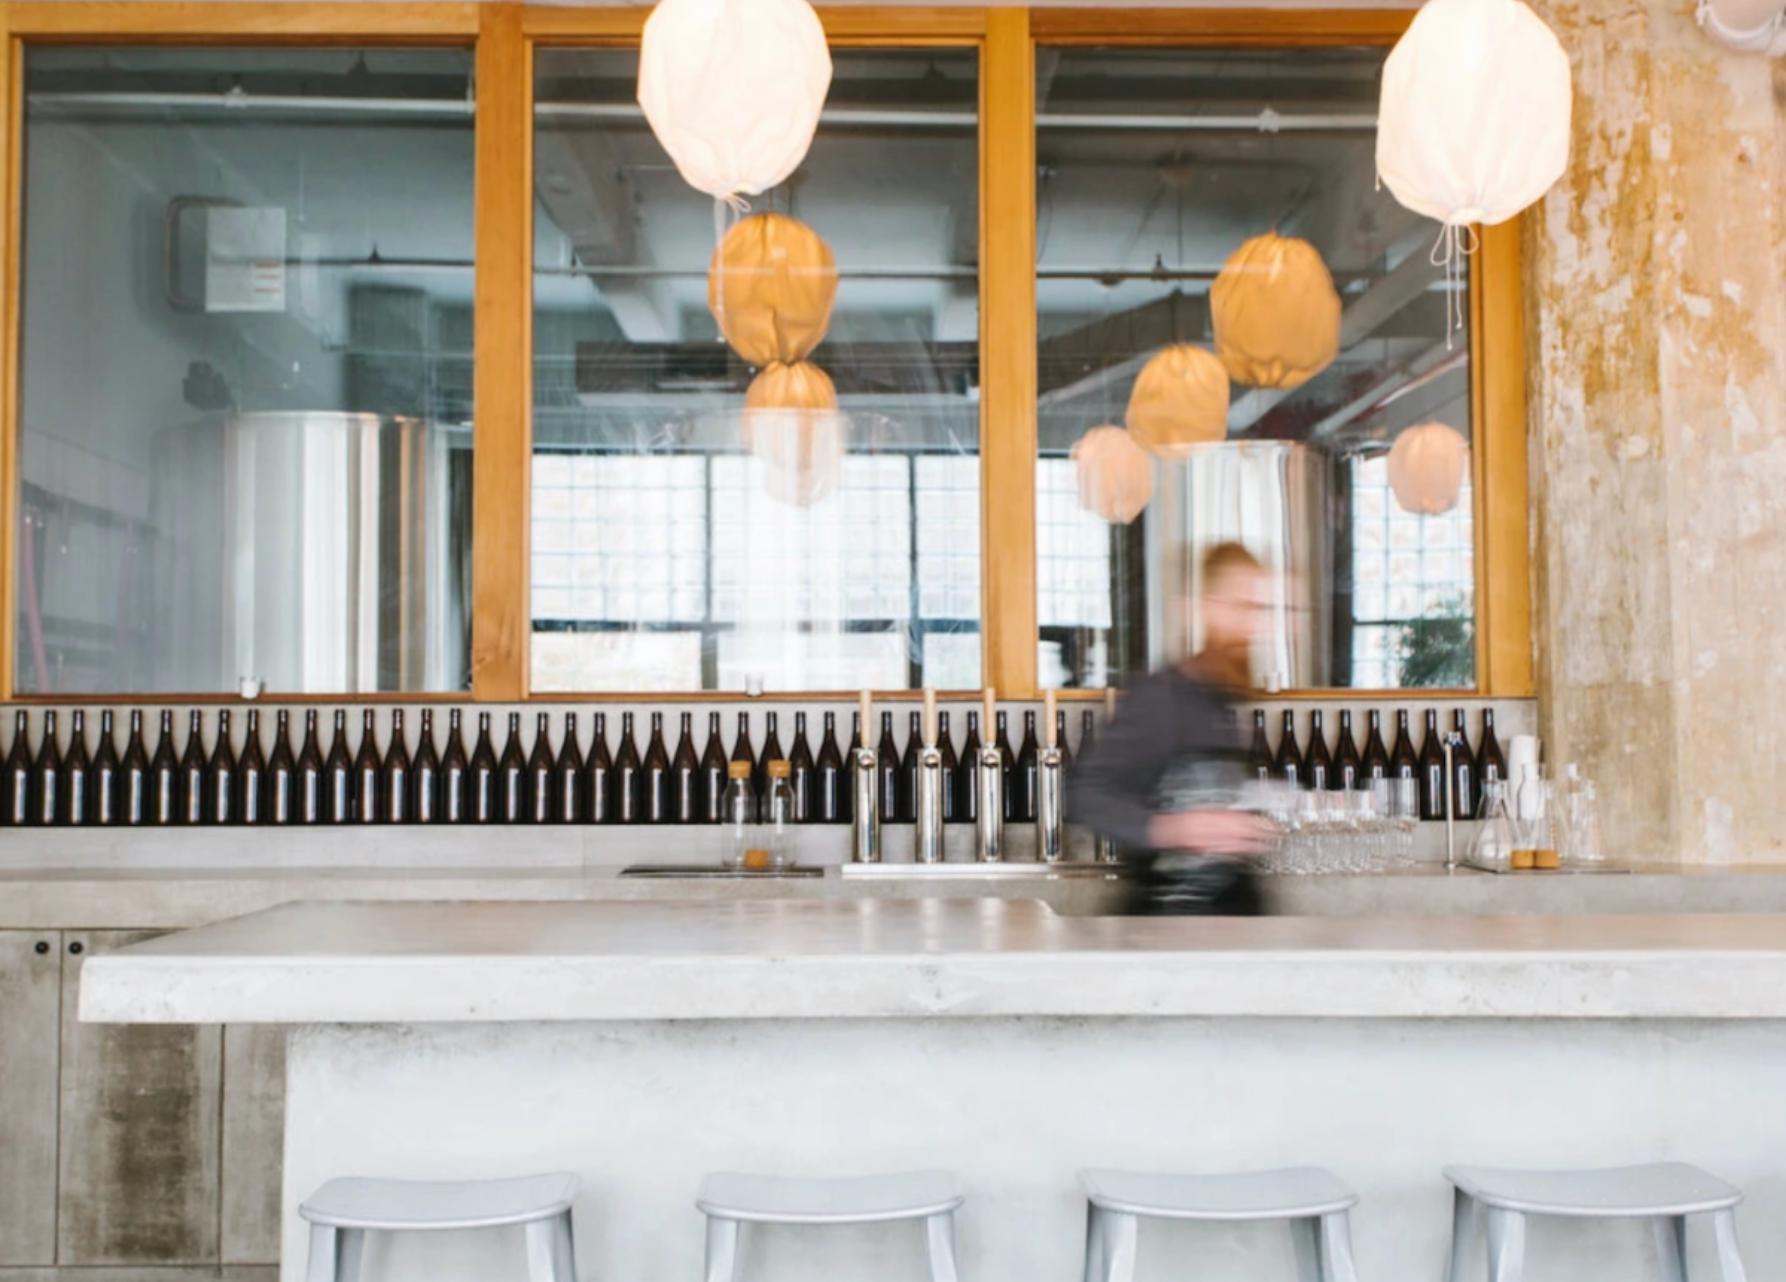 Brandon Doughan moving behind the bar © Polaner Selections